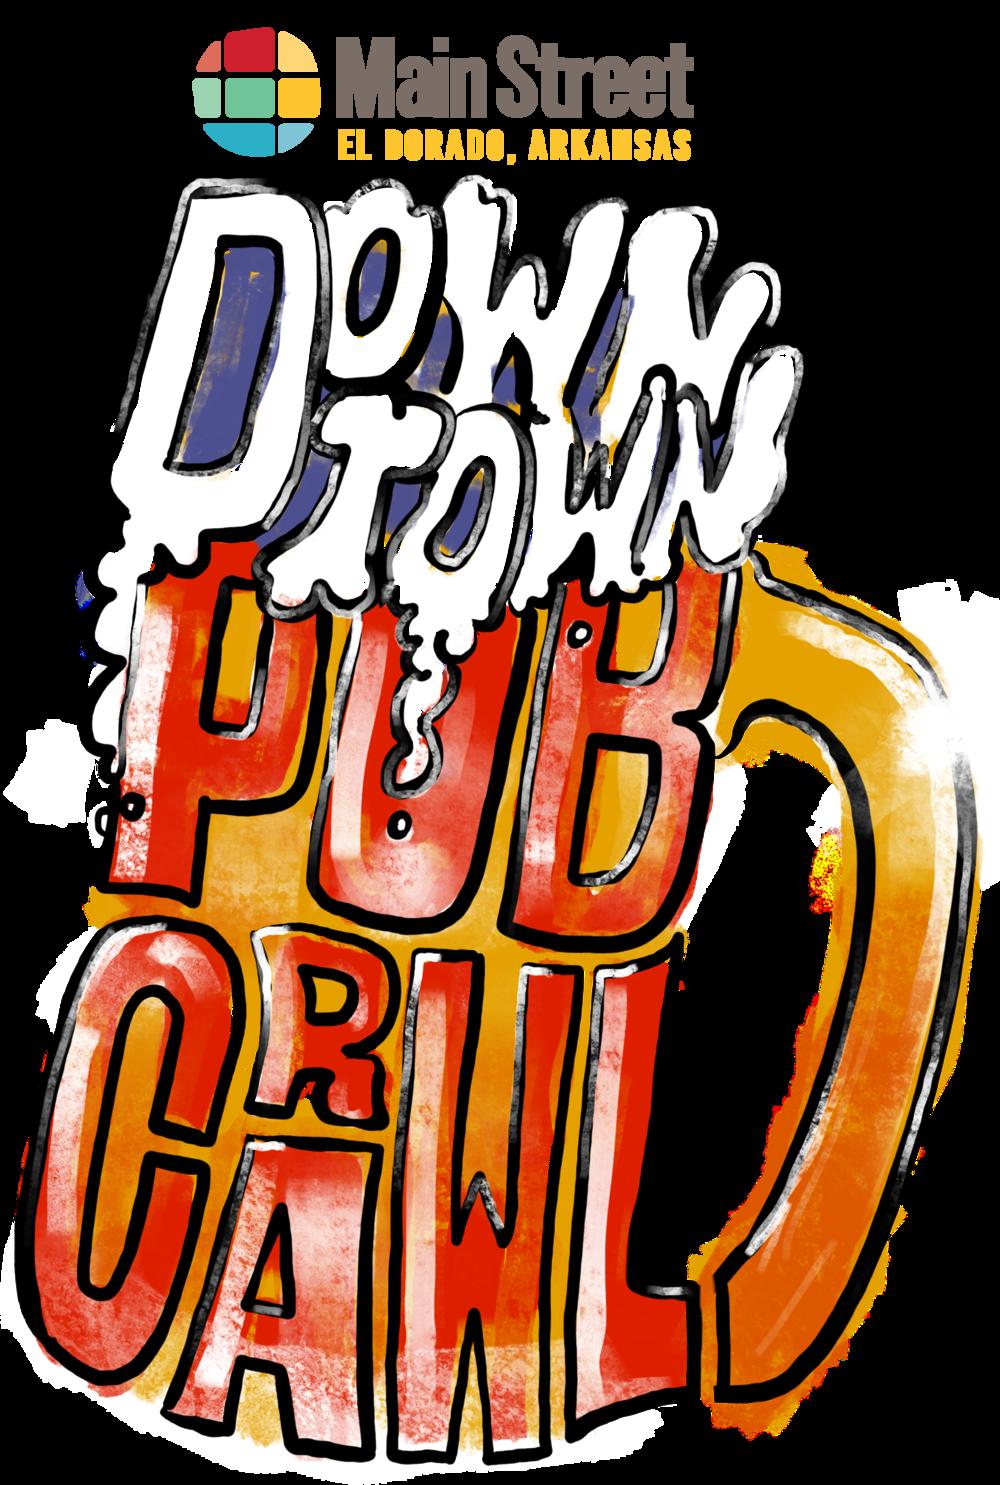 Pub_Crawl-Mainstreet.png